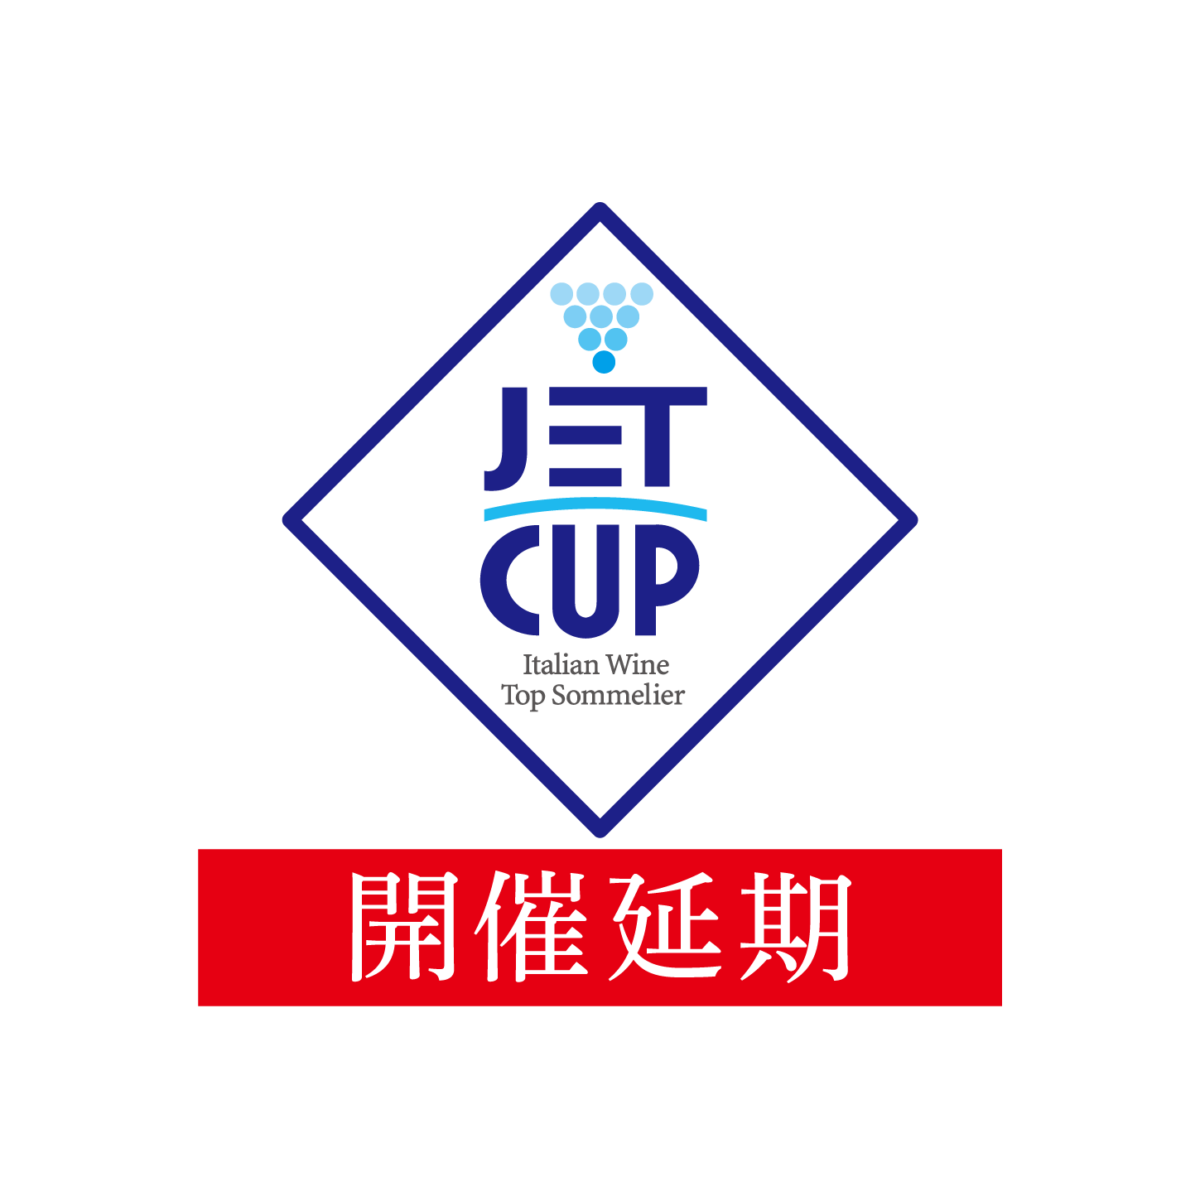 <strong>第14回 JETCUP イタリアワイン・ベスト・ソムリエ・コンクール開催延期のお知らせ</strong>